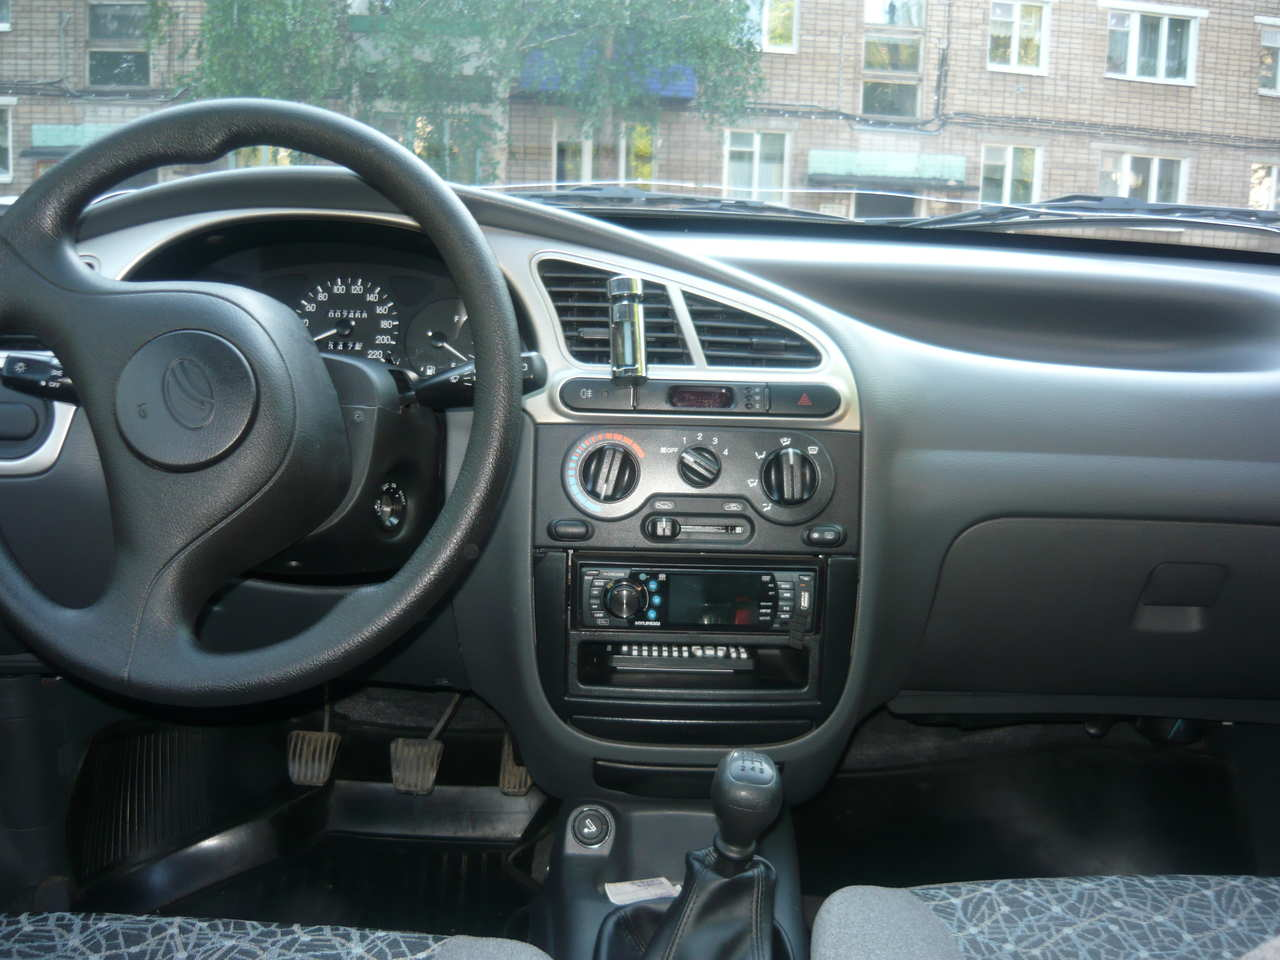 Daewoo Matiz Interior Fuse Box Location - Wiring Diagrams 24 on